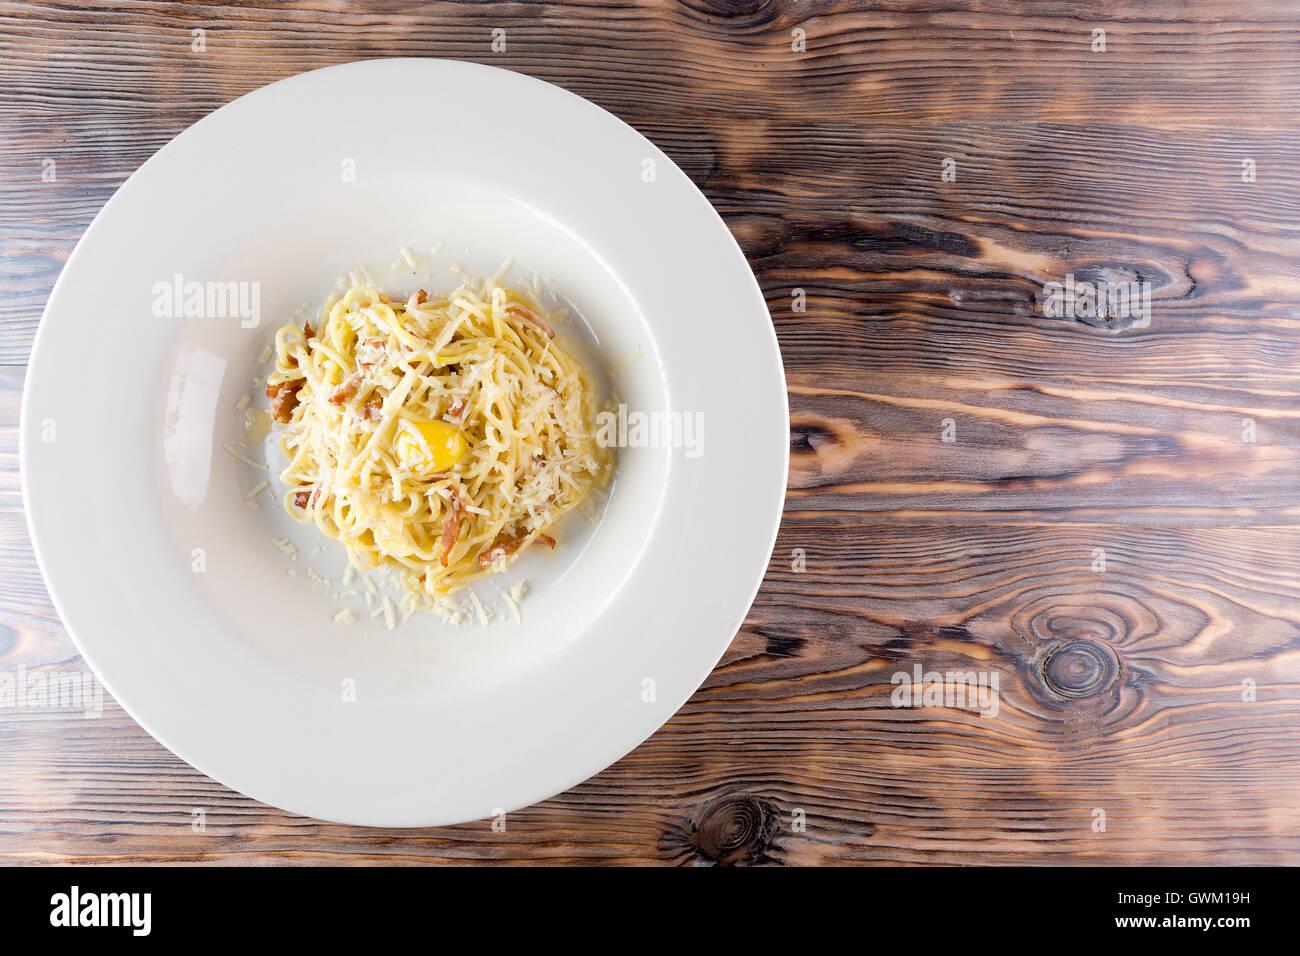 Pasta con huevo sobre fondo de madera. Imagen De Stock